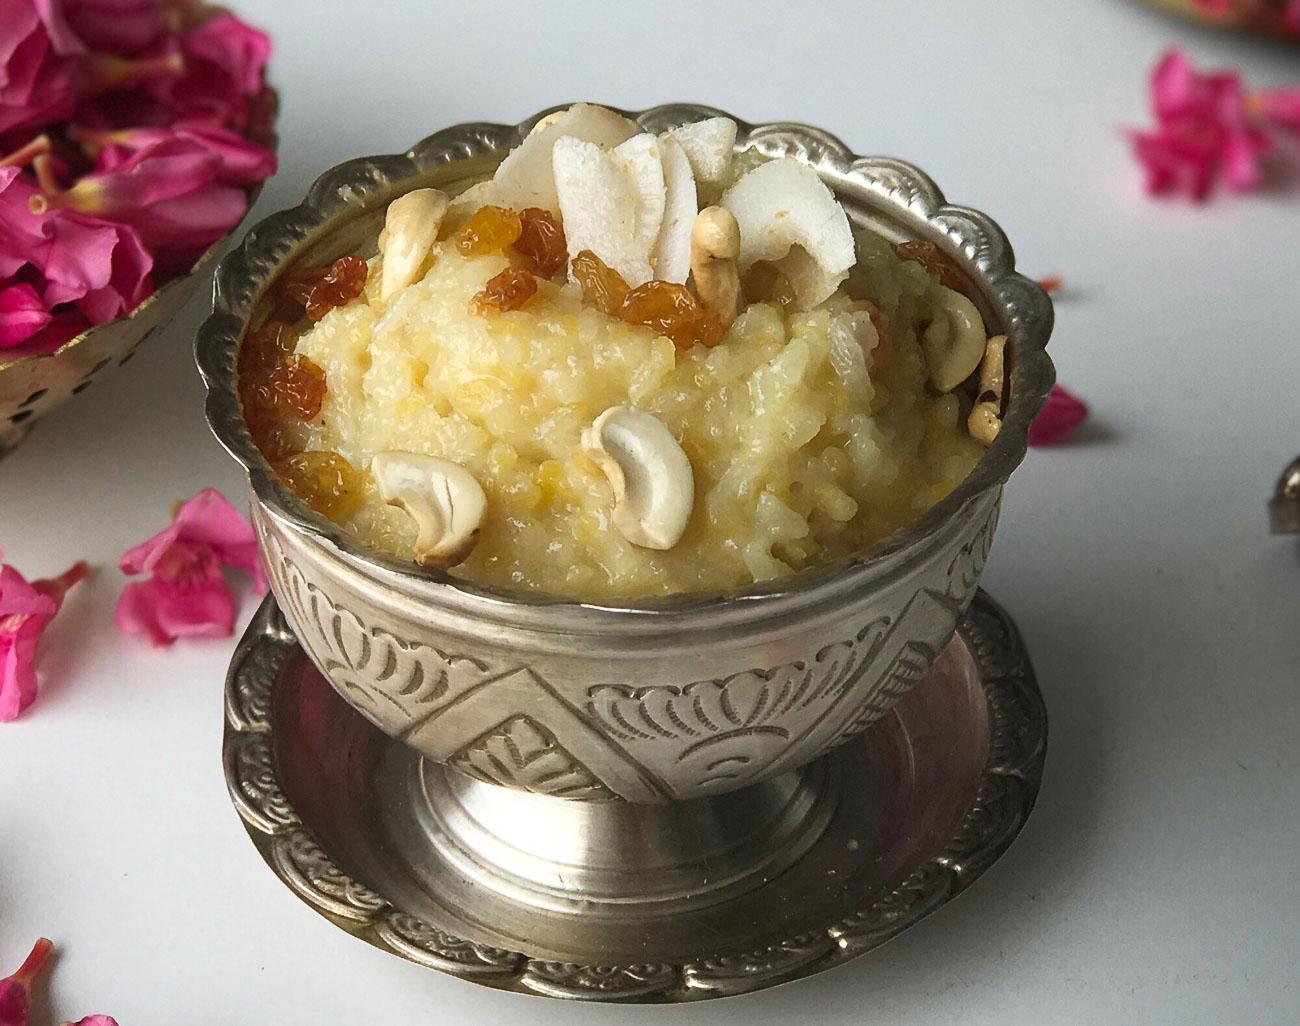 Chakkra pongali recipe andhra style sweet pongal by archanas kitchen chakkra pongali recipe andhra style sweet pongal forumfinder Choice Image